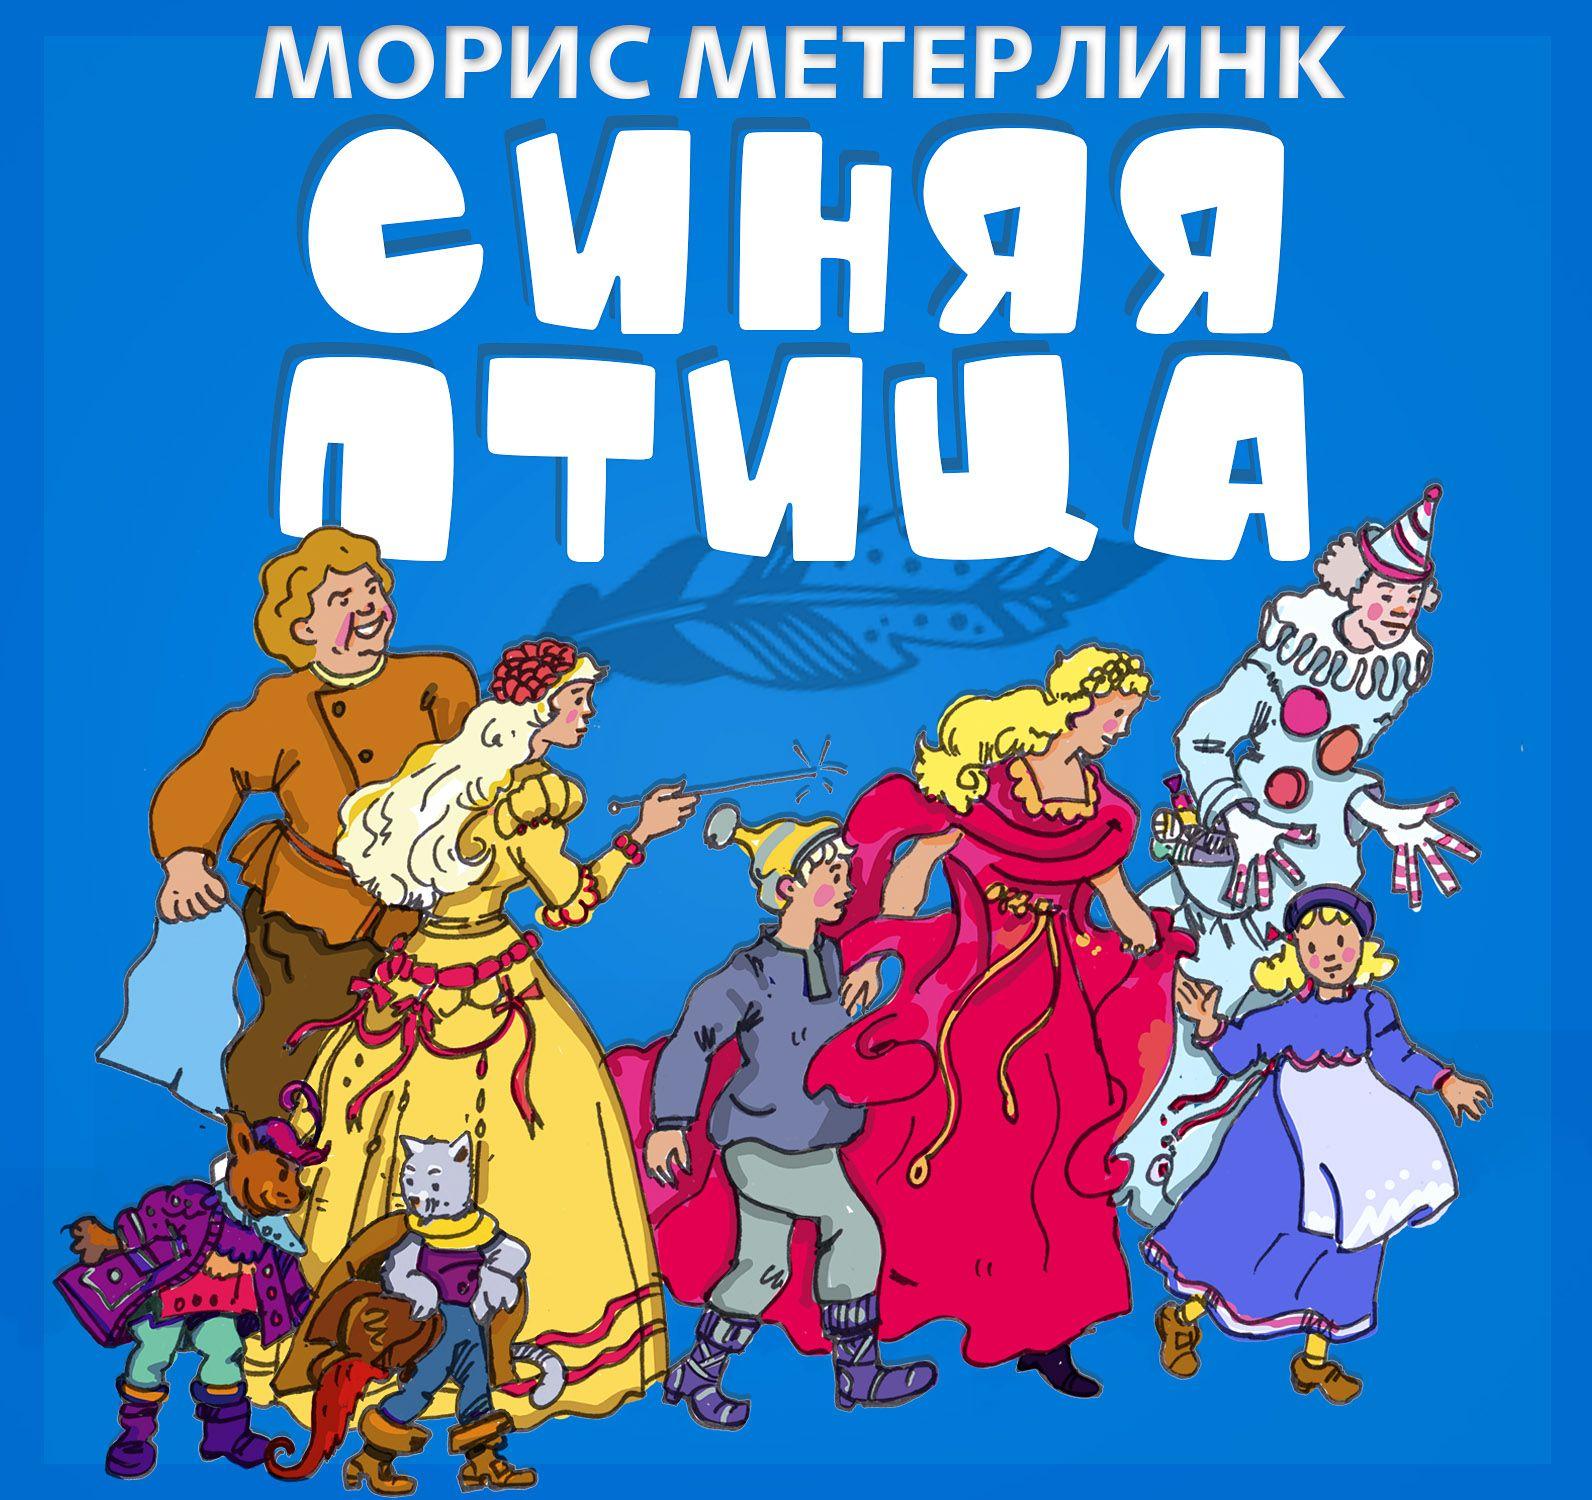 Купить книгу Синяя птица, автора Мориса Метерлинка